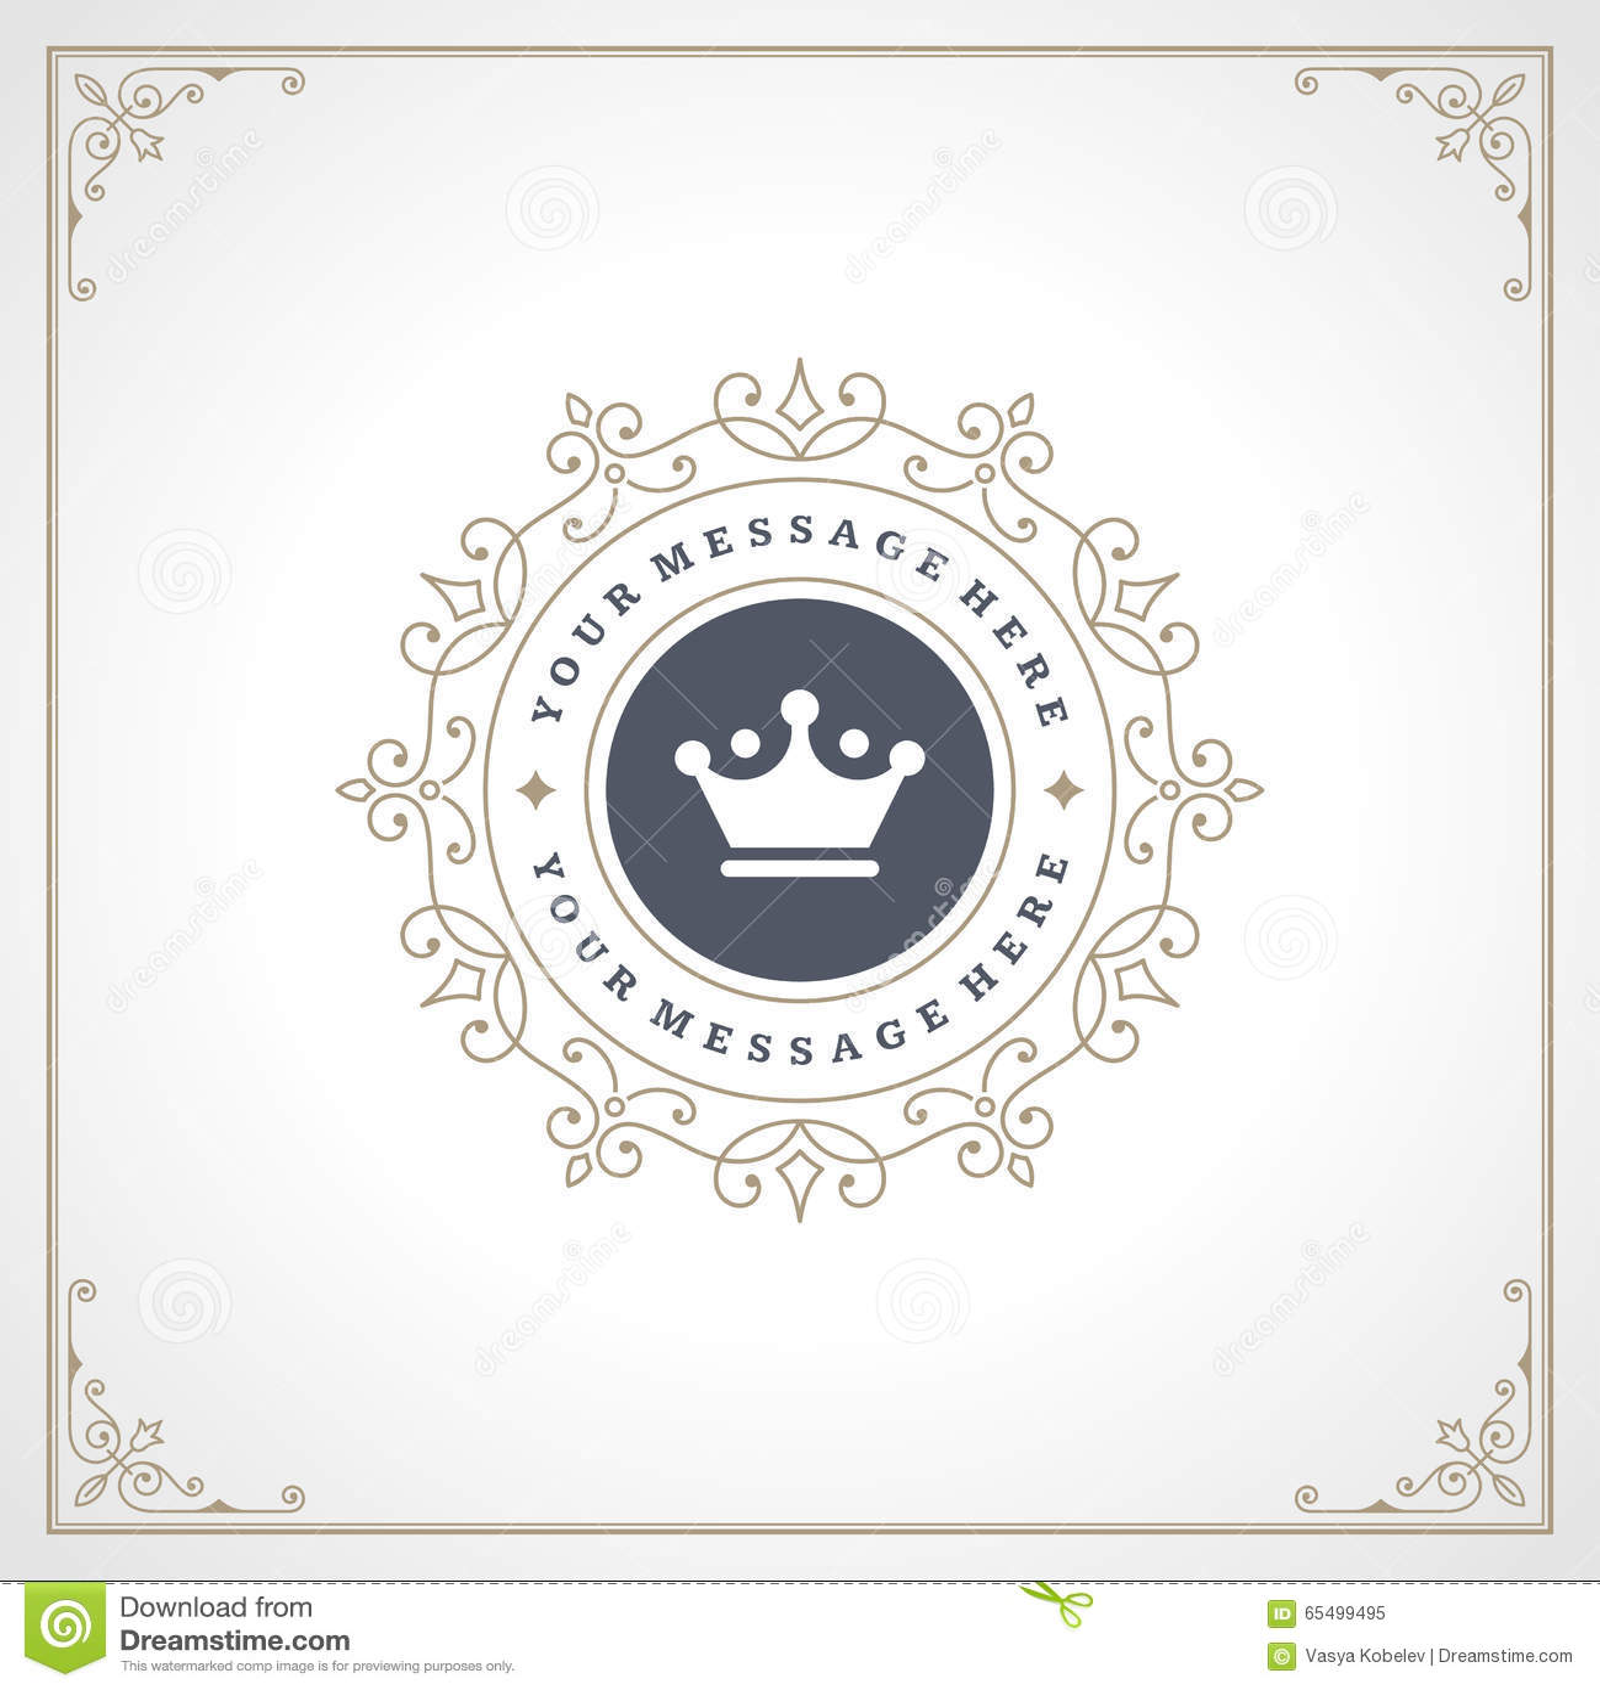 royal logo design template flourishes stock vector image 65499495. Black Bedroom Furniture Sets. Home Design Ideas